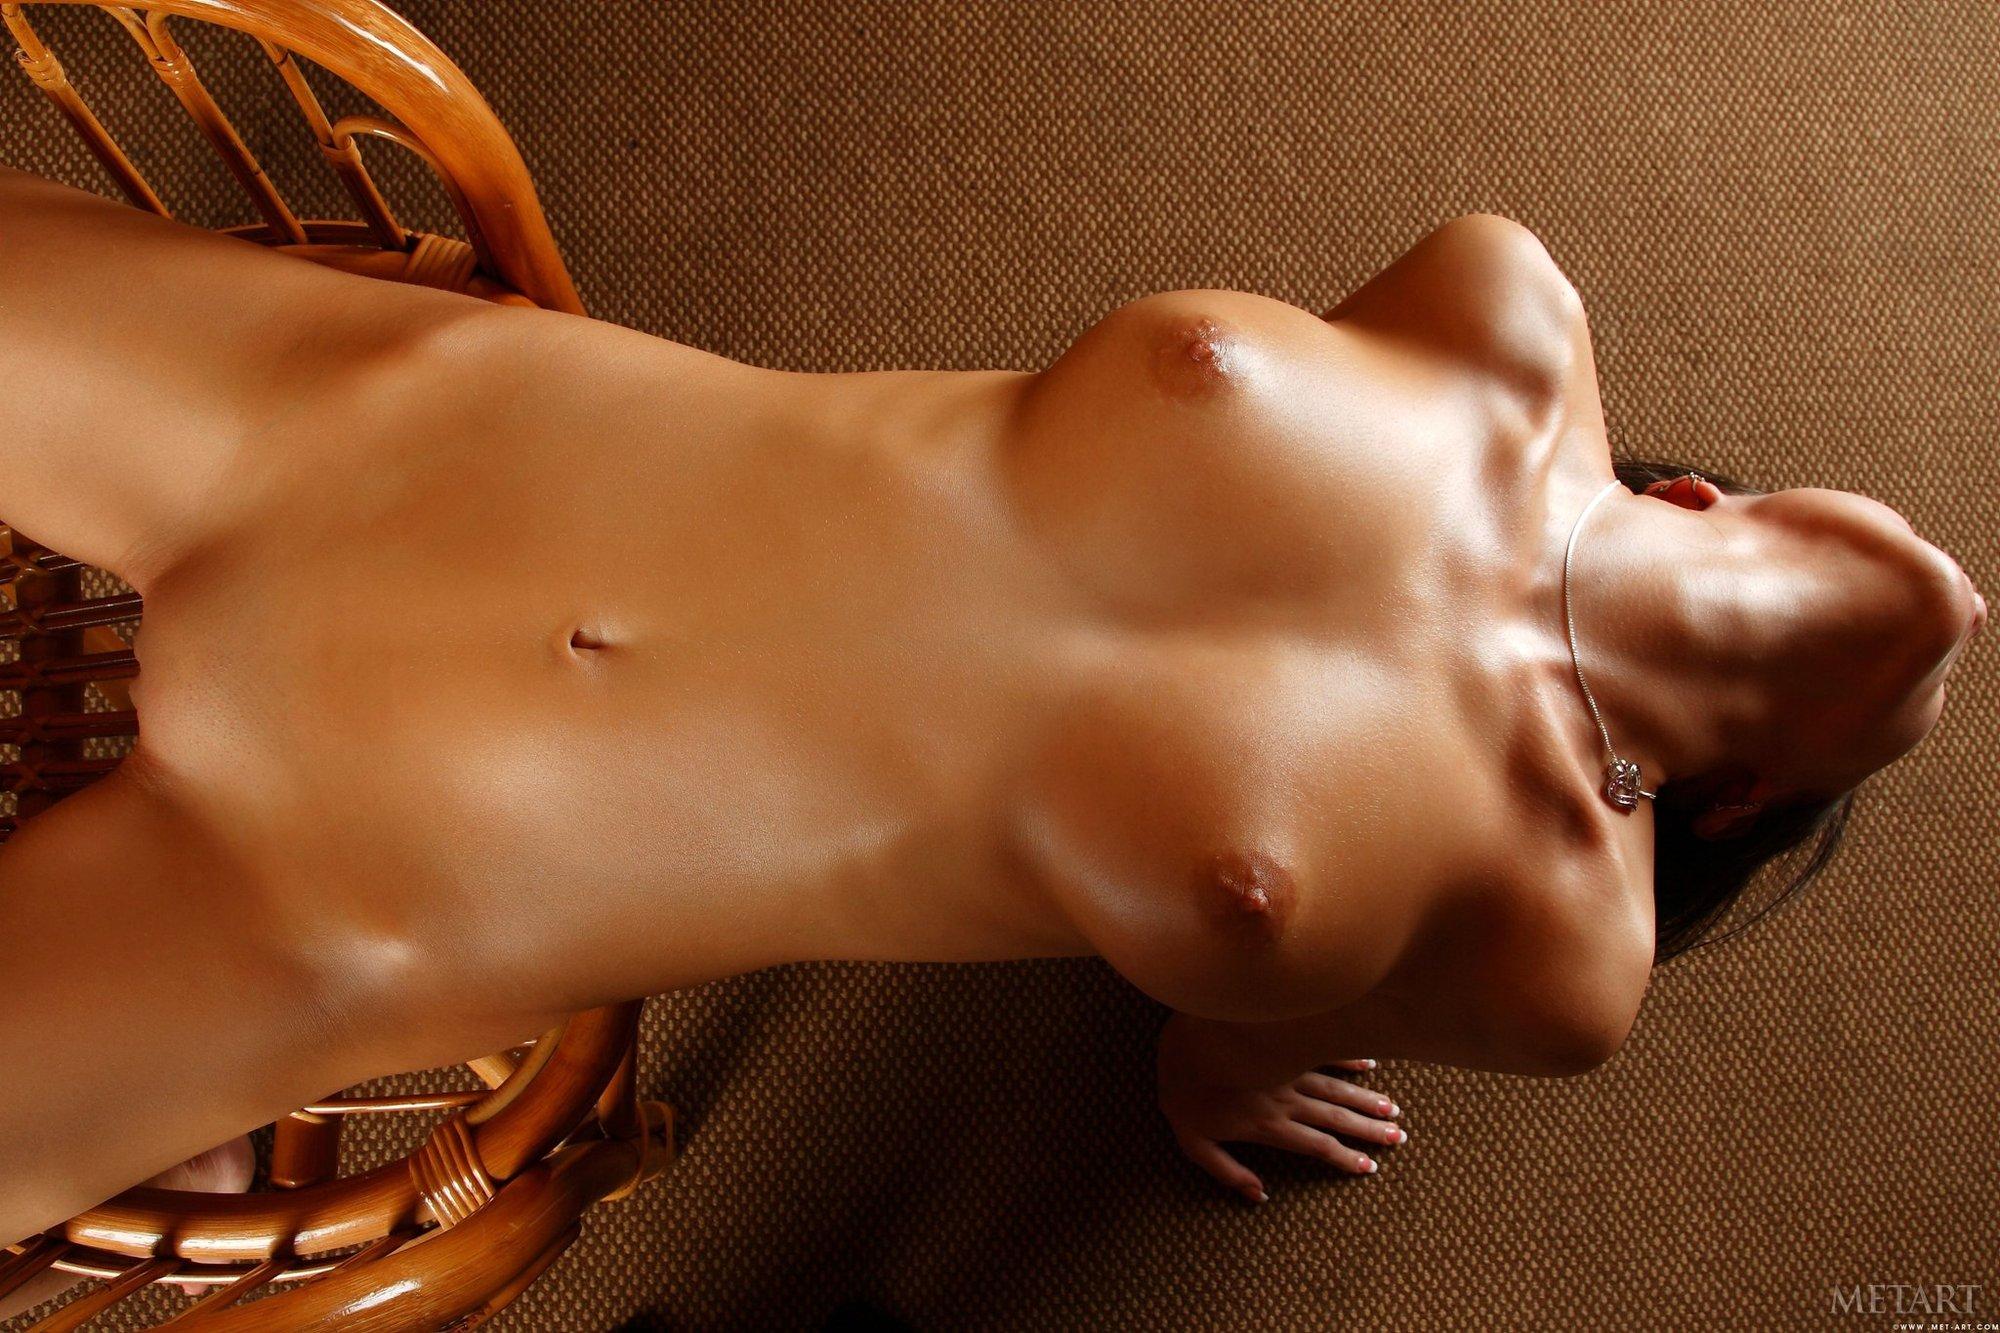 smotret-krasivoe-goloe-zhenskoe-telo